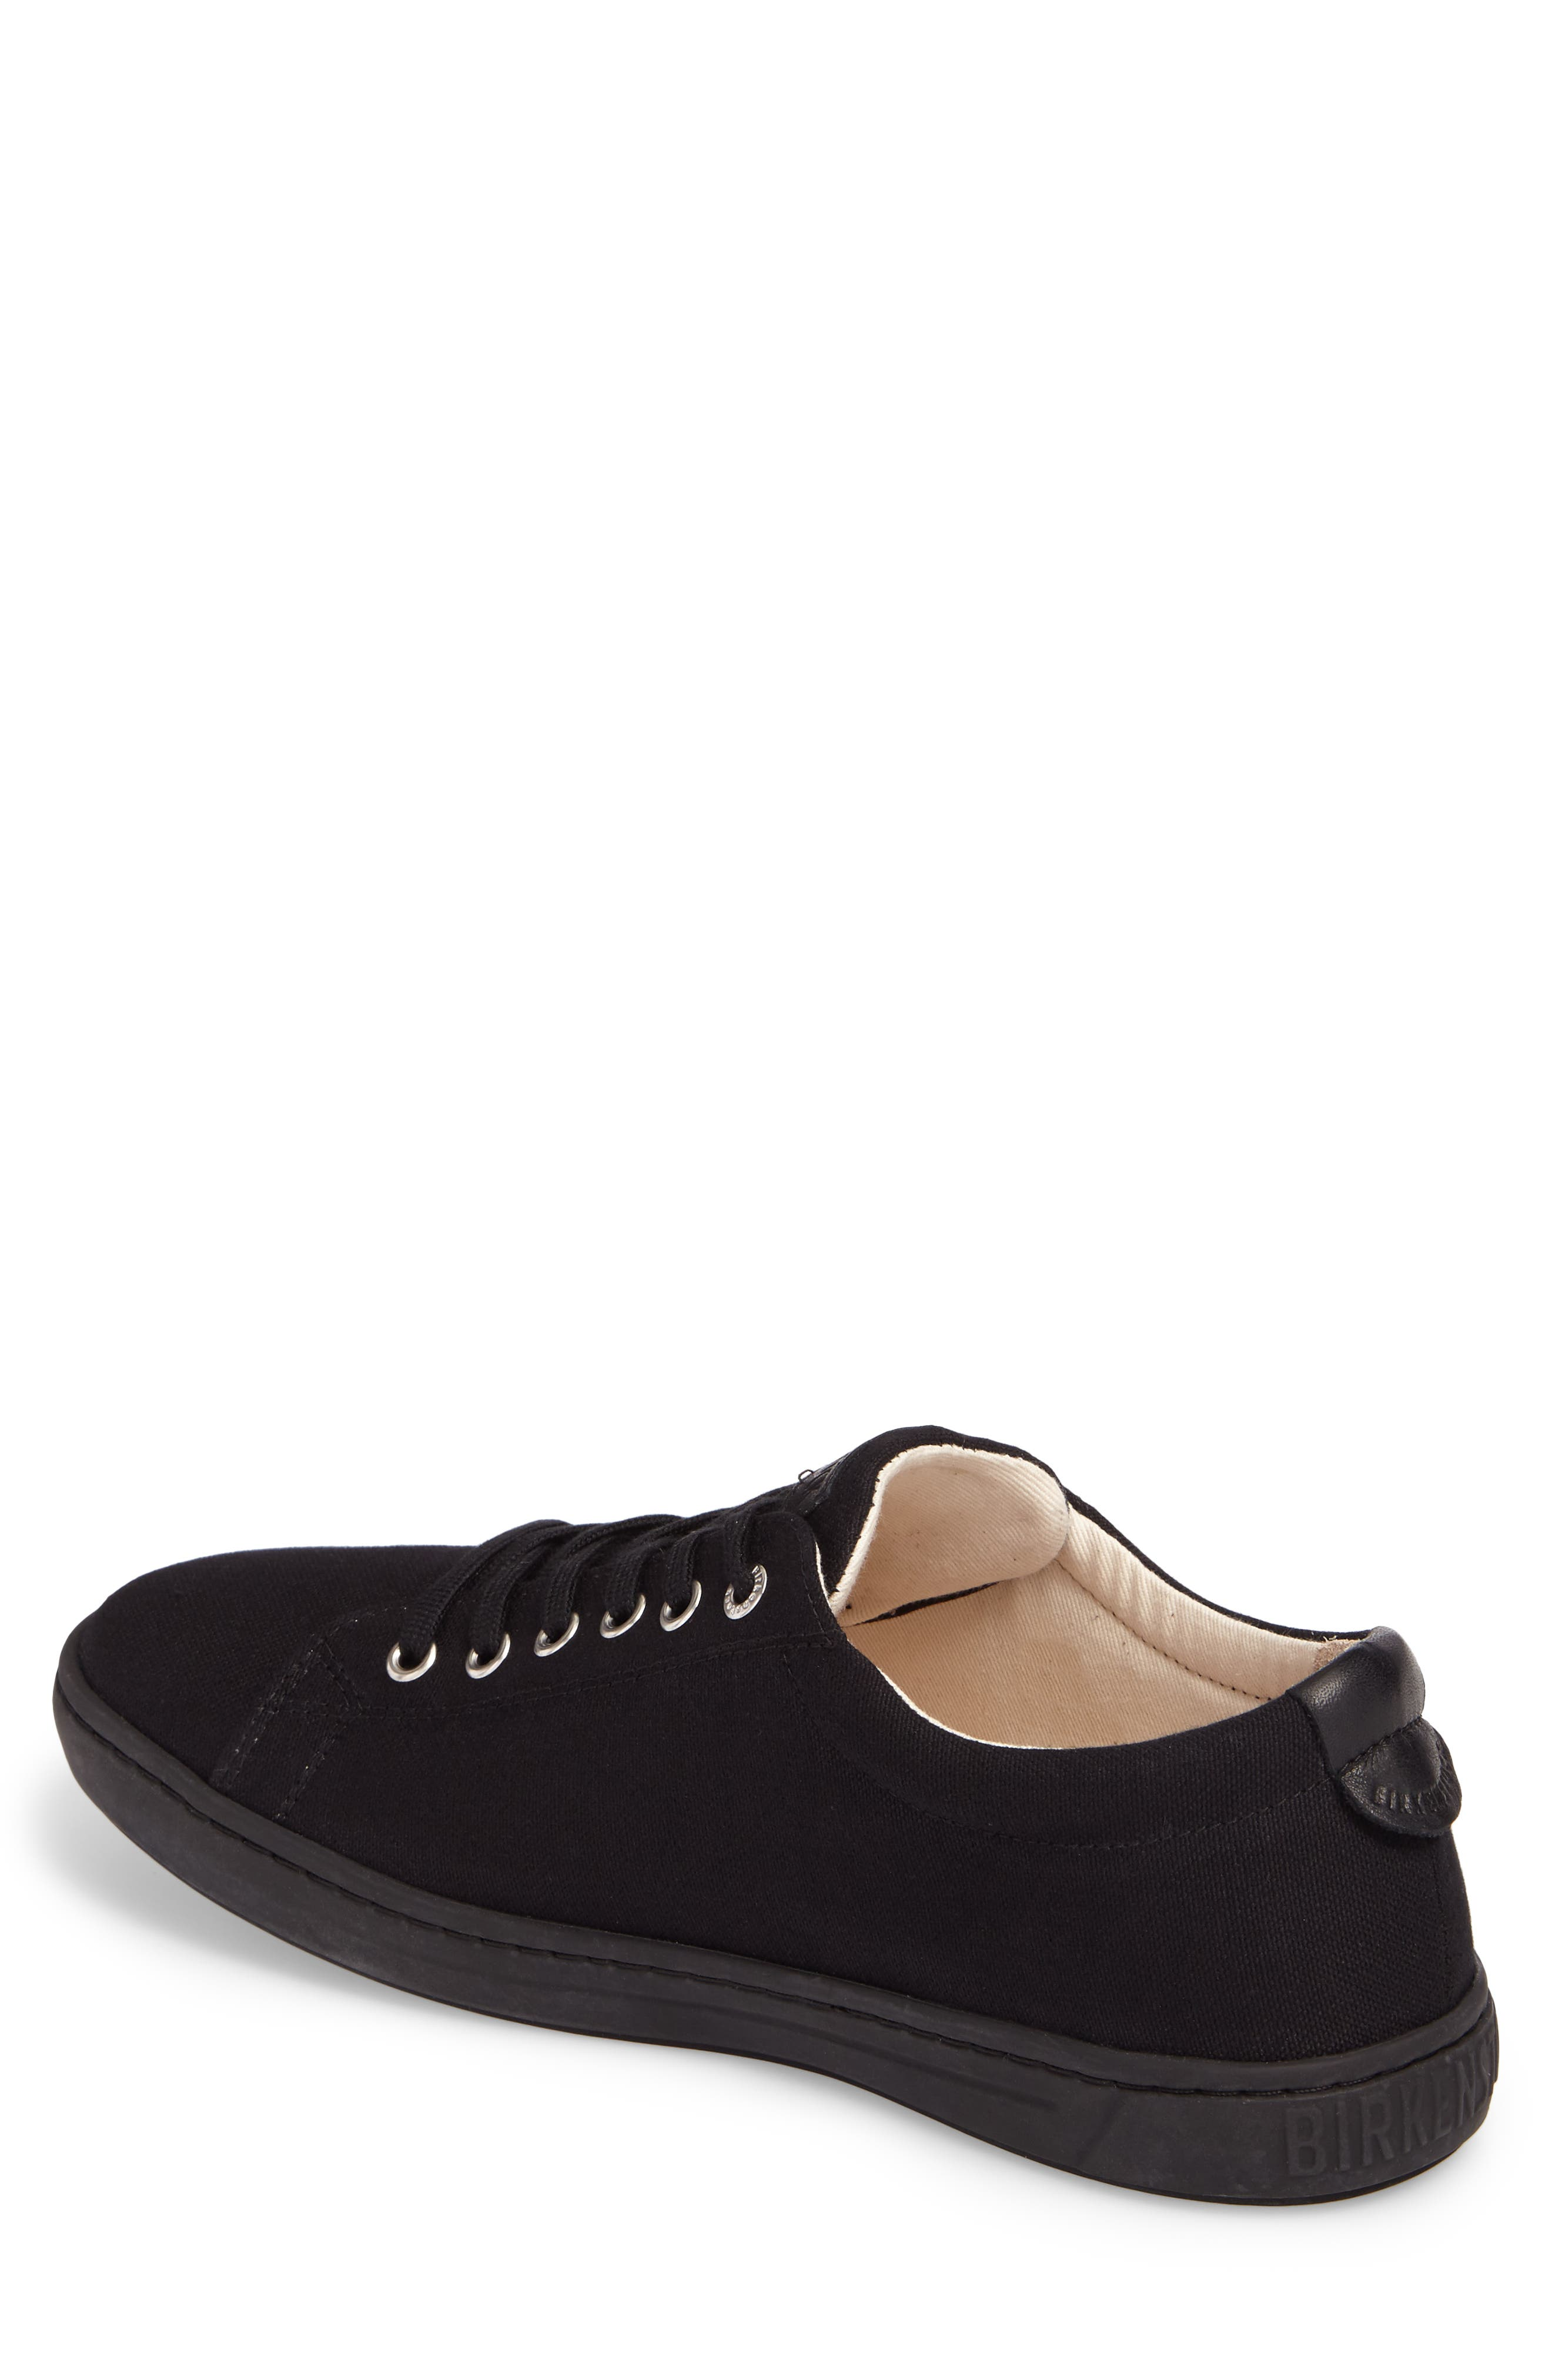 Arran Sneaker,                             Alternate thumbnail 2, color,                             001